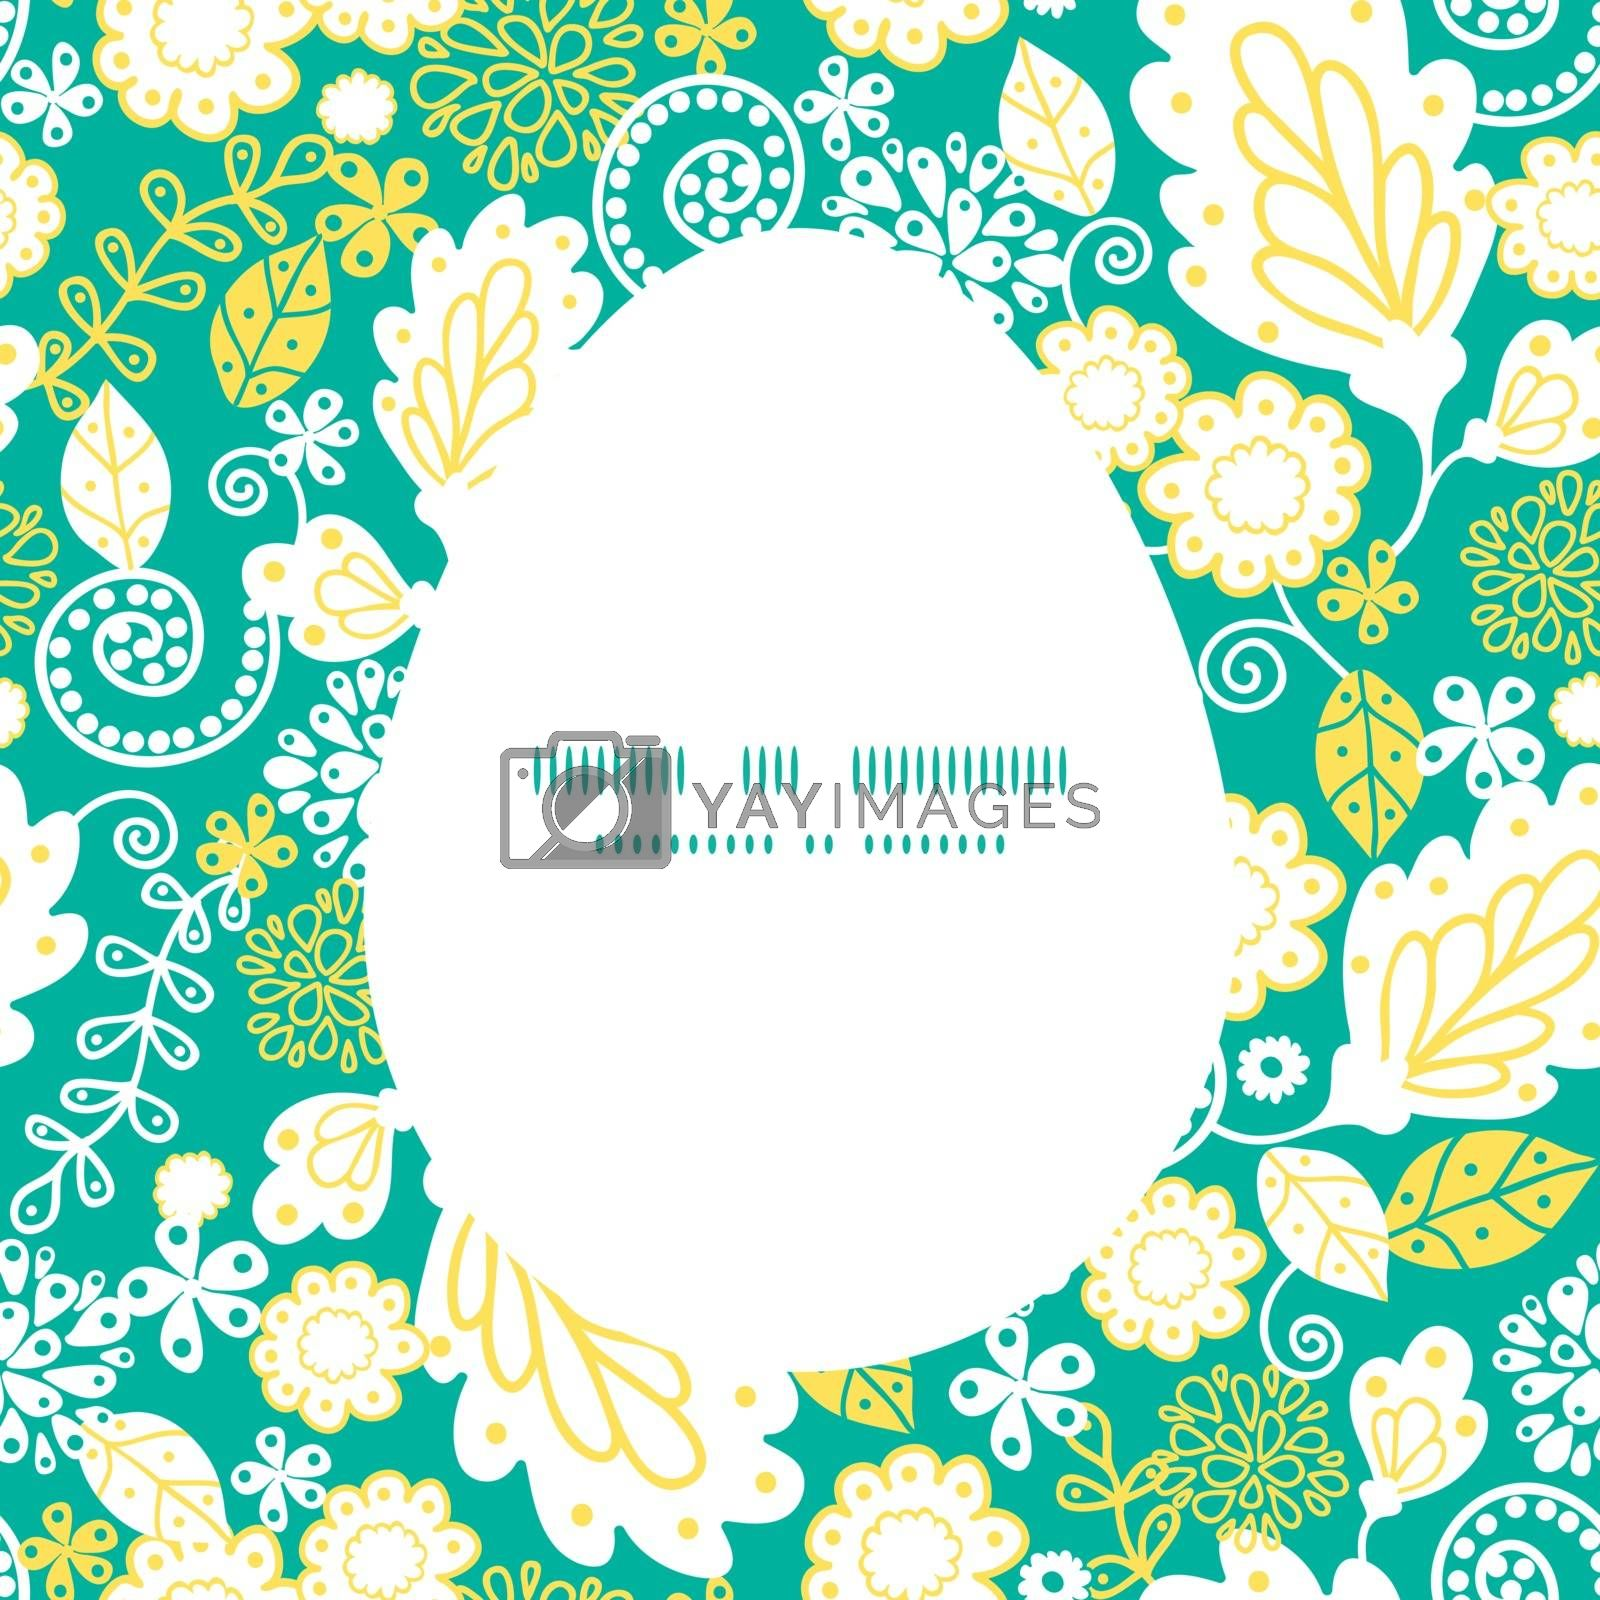 Vector emerald flowerals Easter egg sillhouette frame card template graphic design